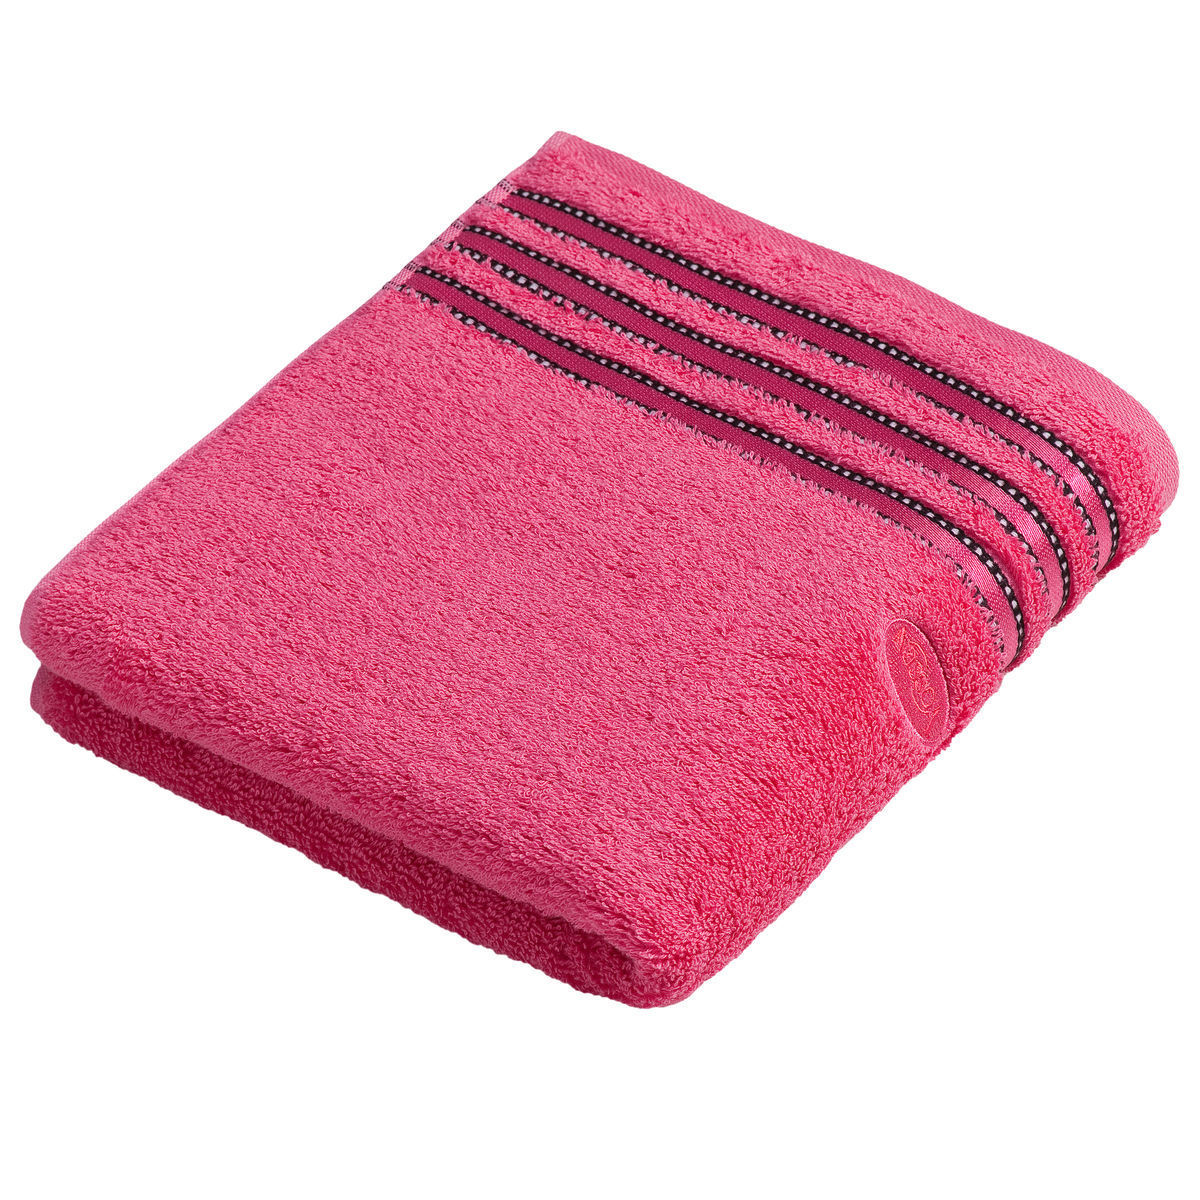 Полотенца Полотенце 30x30 Vossen Cult de Luxe rosy pink elitnoe-polotentse-cult-de-luxe-rosy-pink-ot-vossen-avstriya-50x100-1.jpg